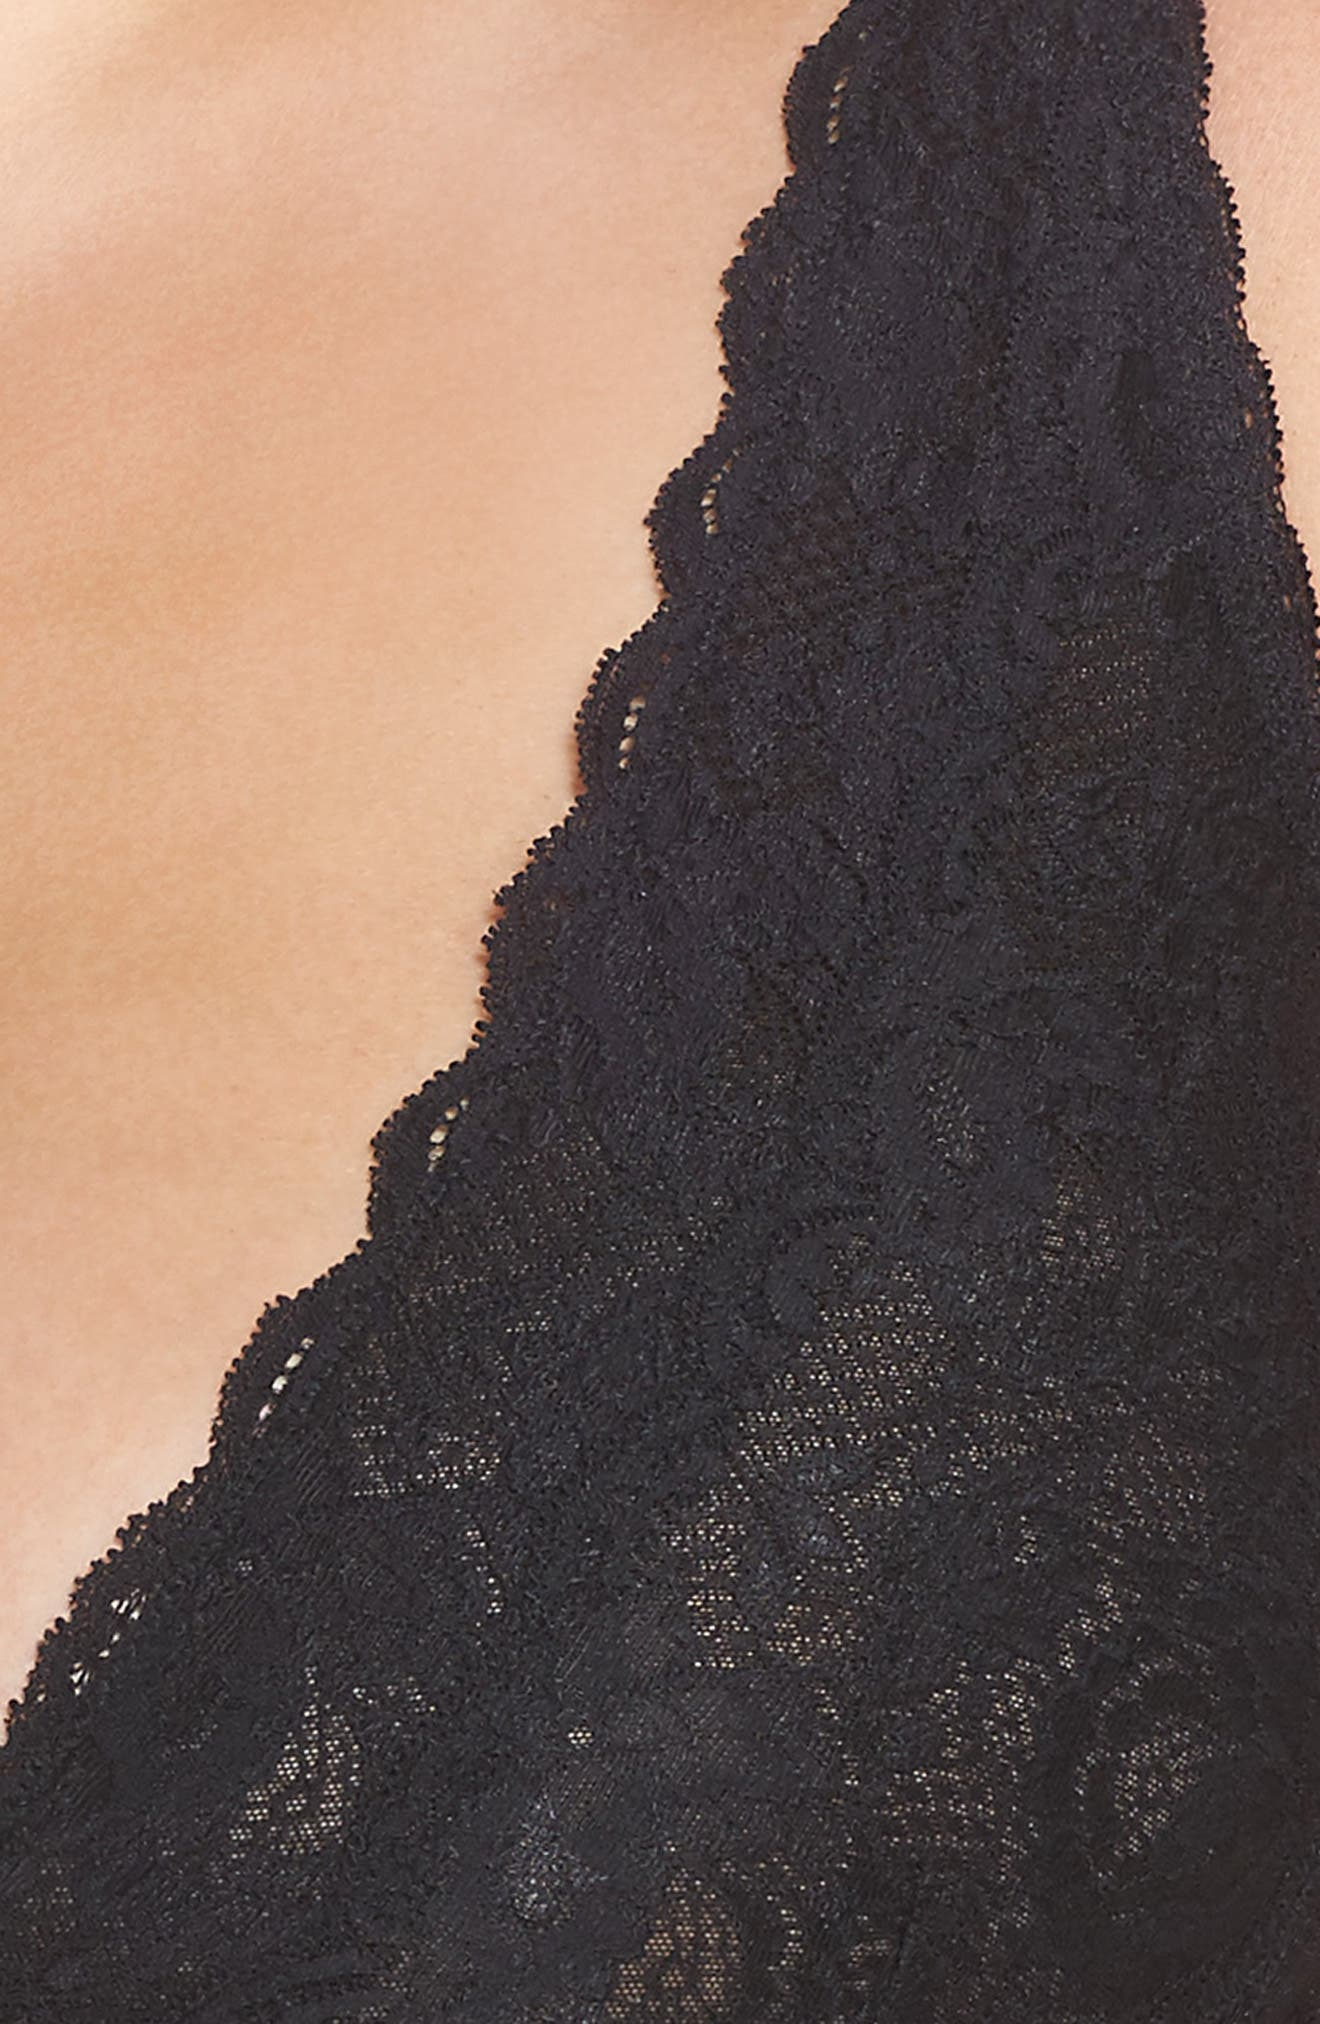 Never Say Never Plungie Lace Longline Bralette,                             Main thumbnail 1, color,                             Black